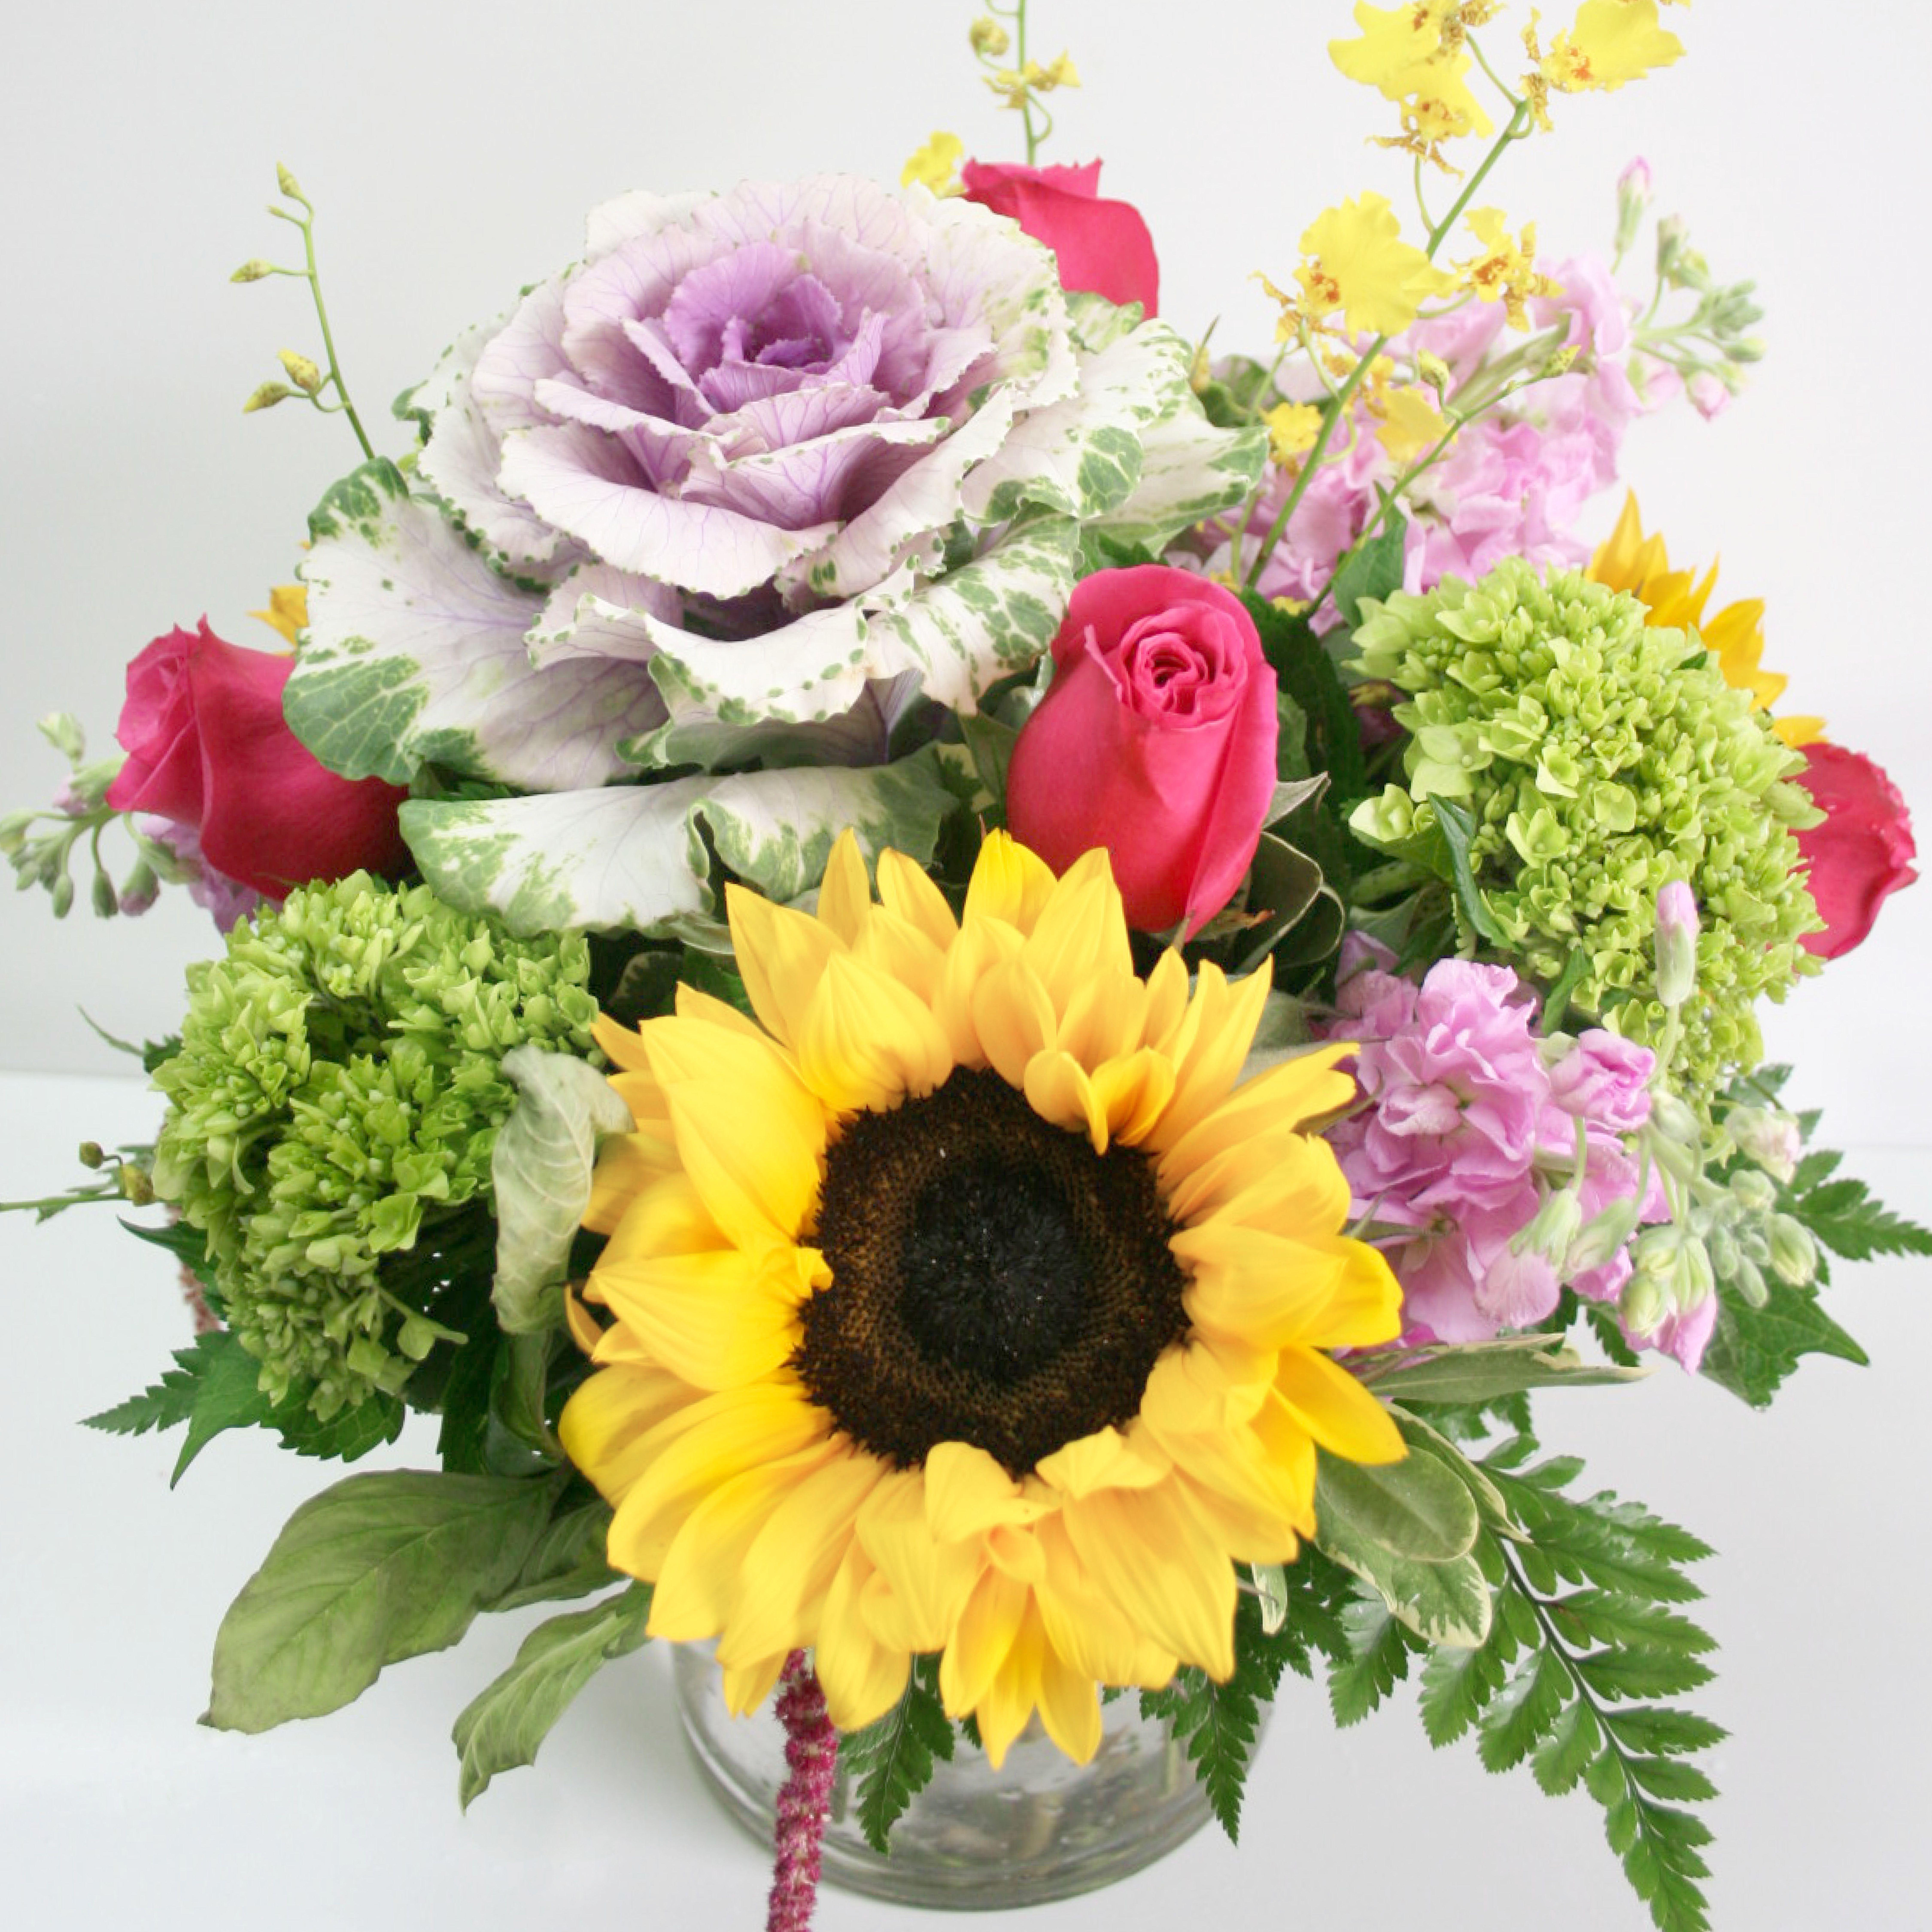 Freytag's Florist Summer Arrangement Austin, TX